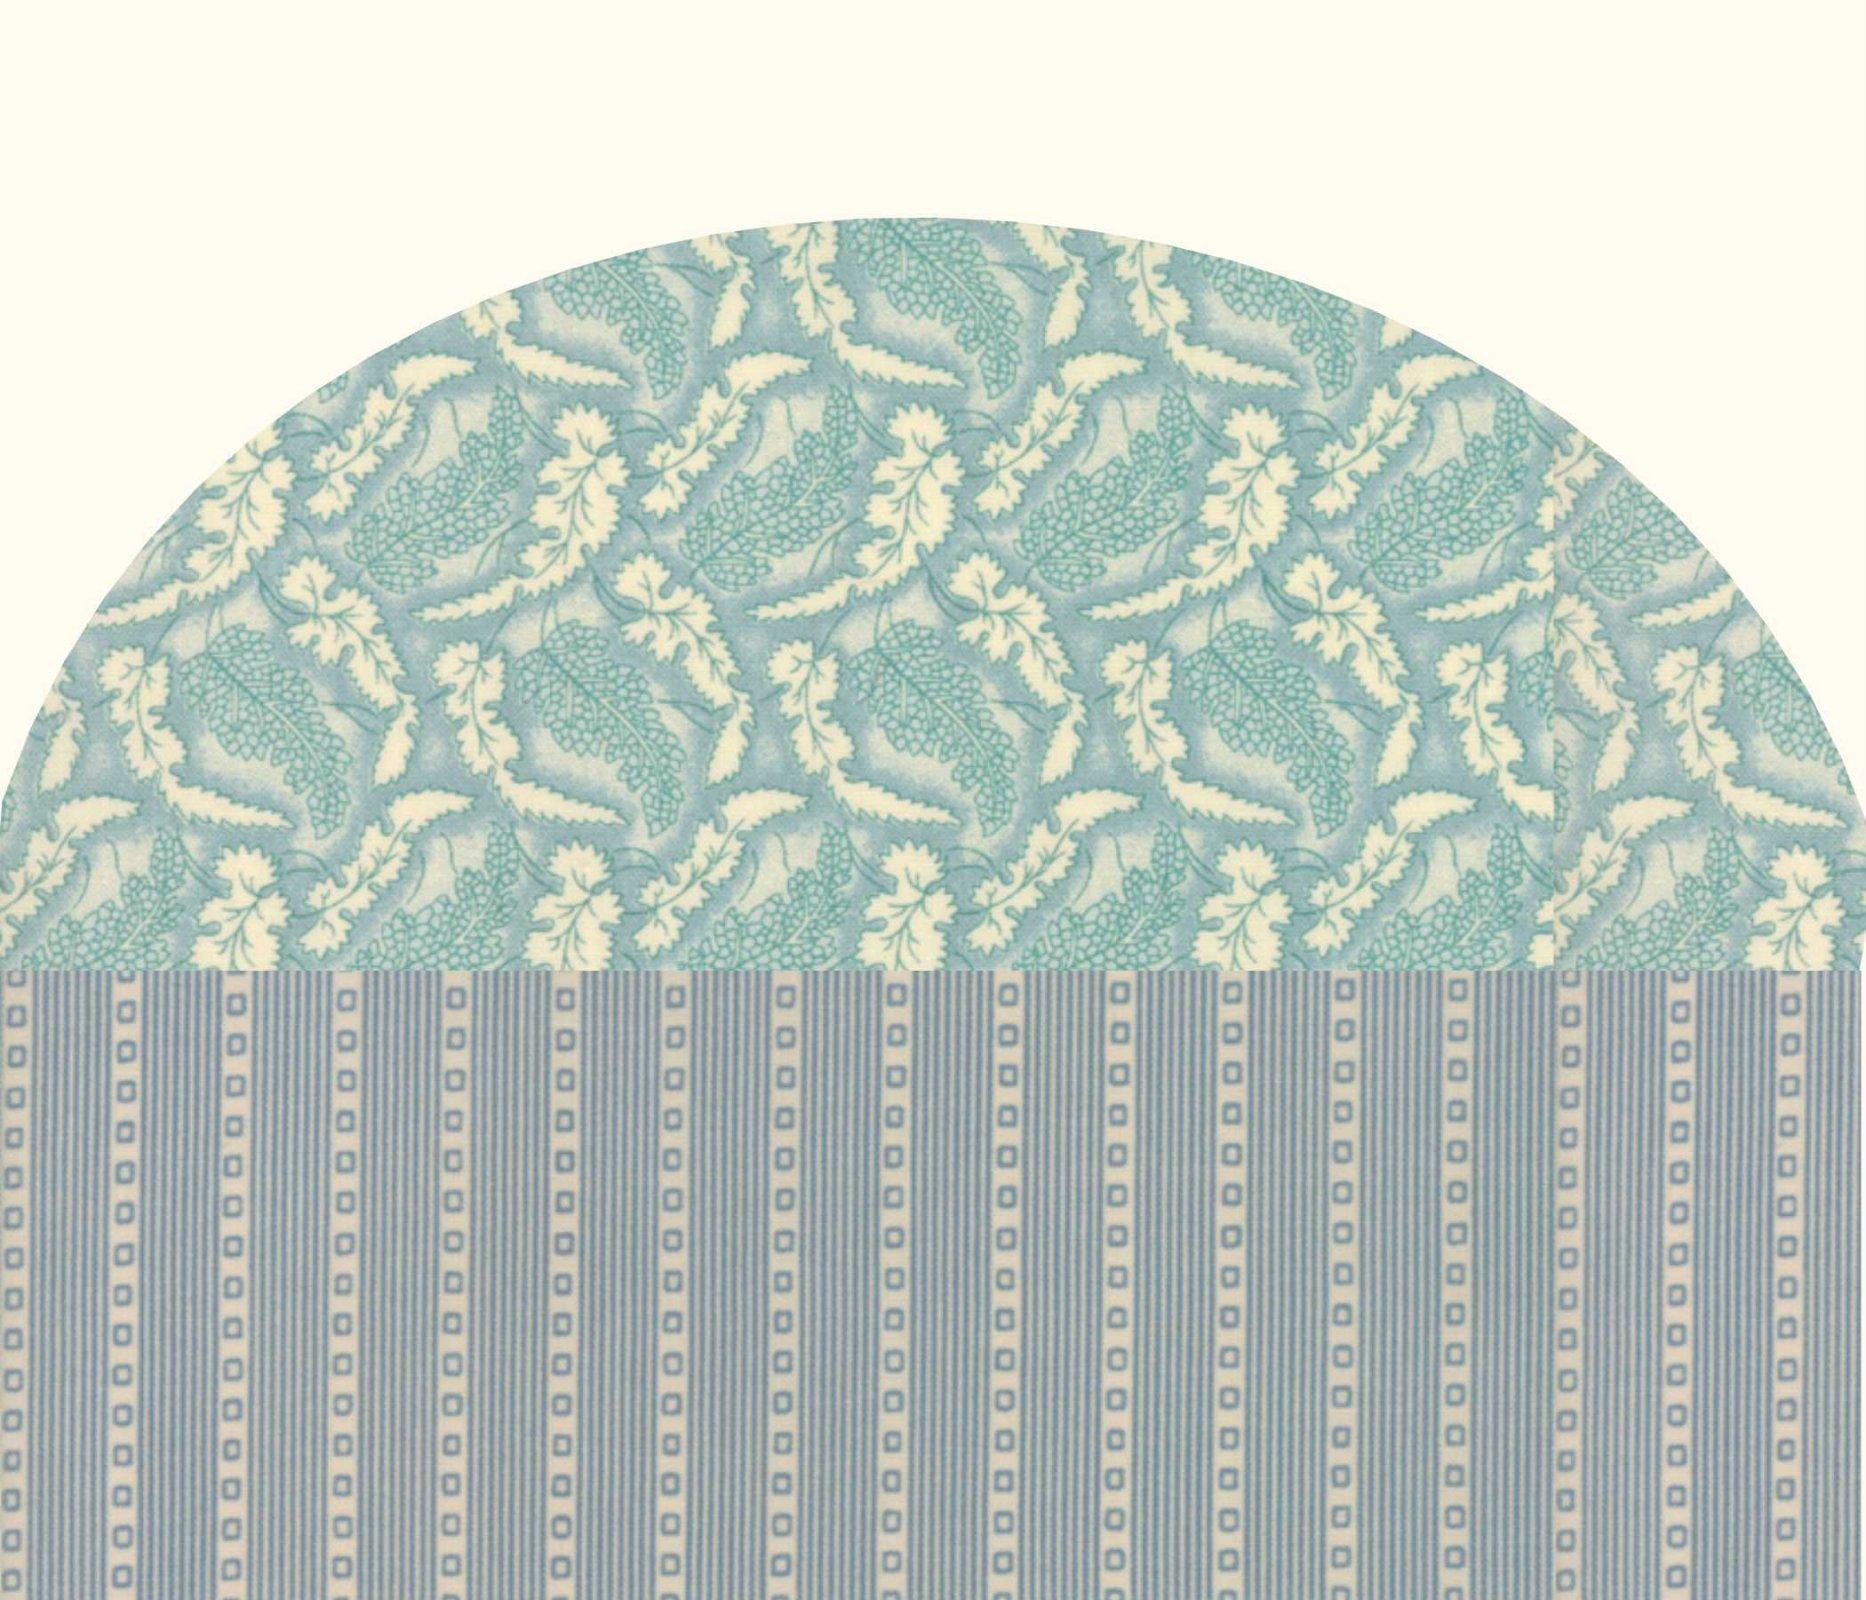 Little Lacie Bag - Powder Blue Elegance Fabric Kit